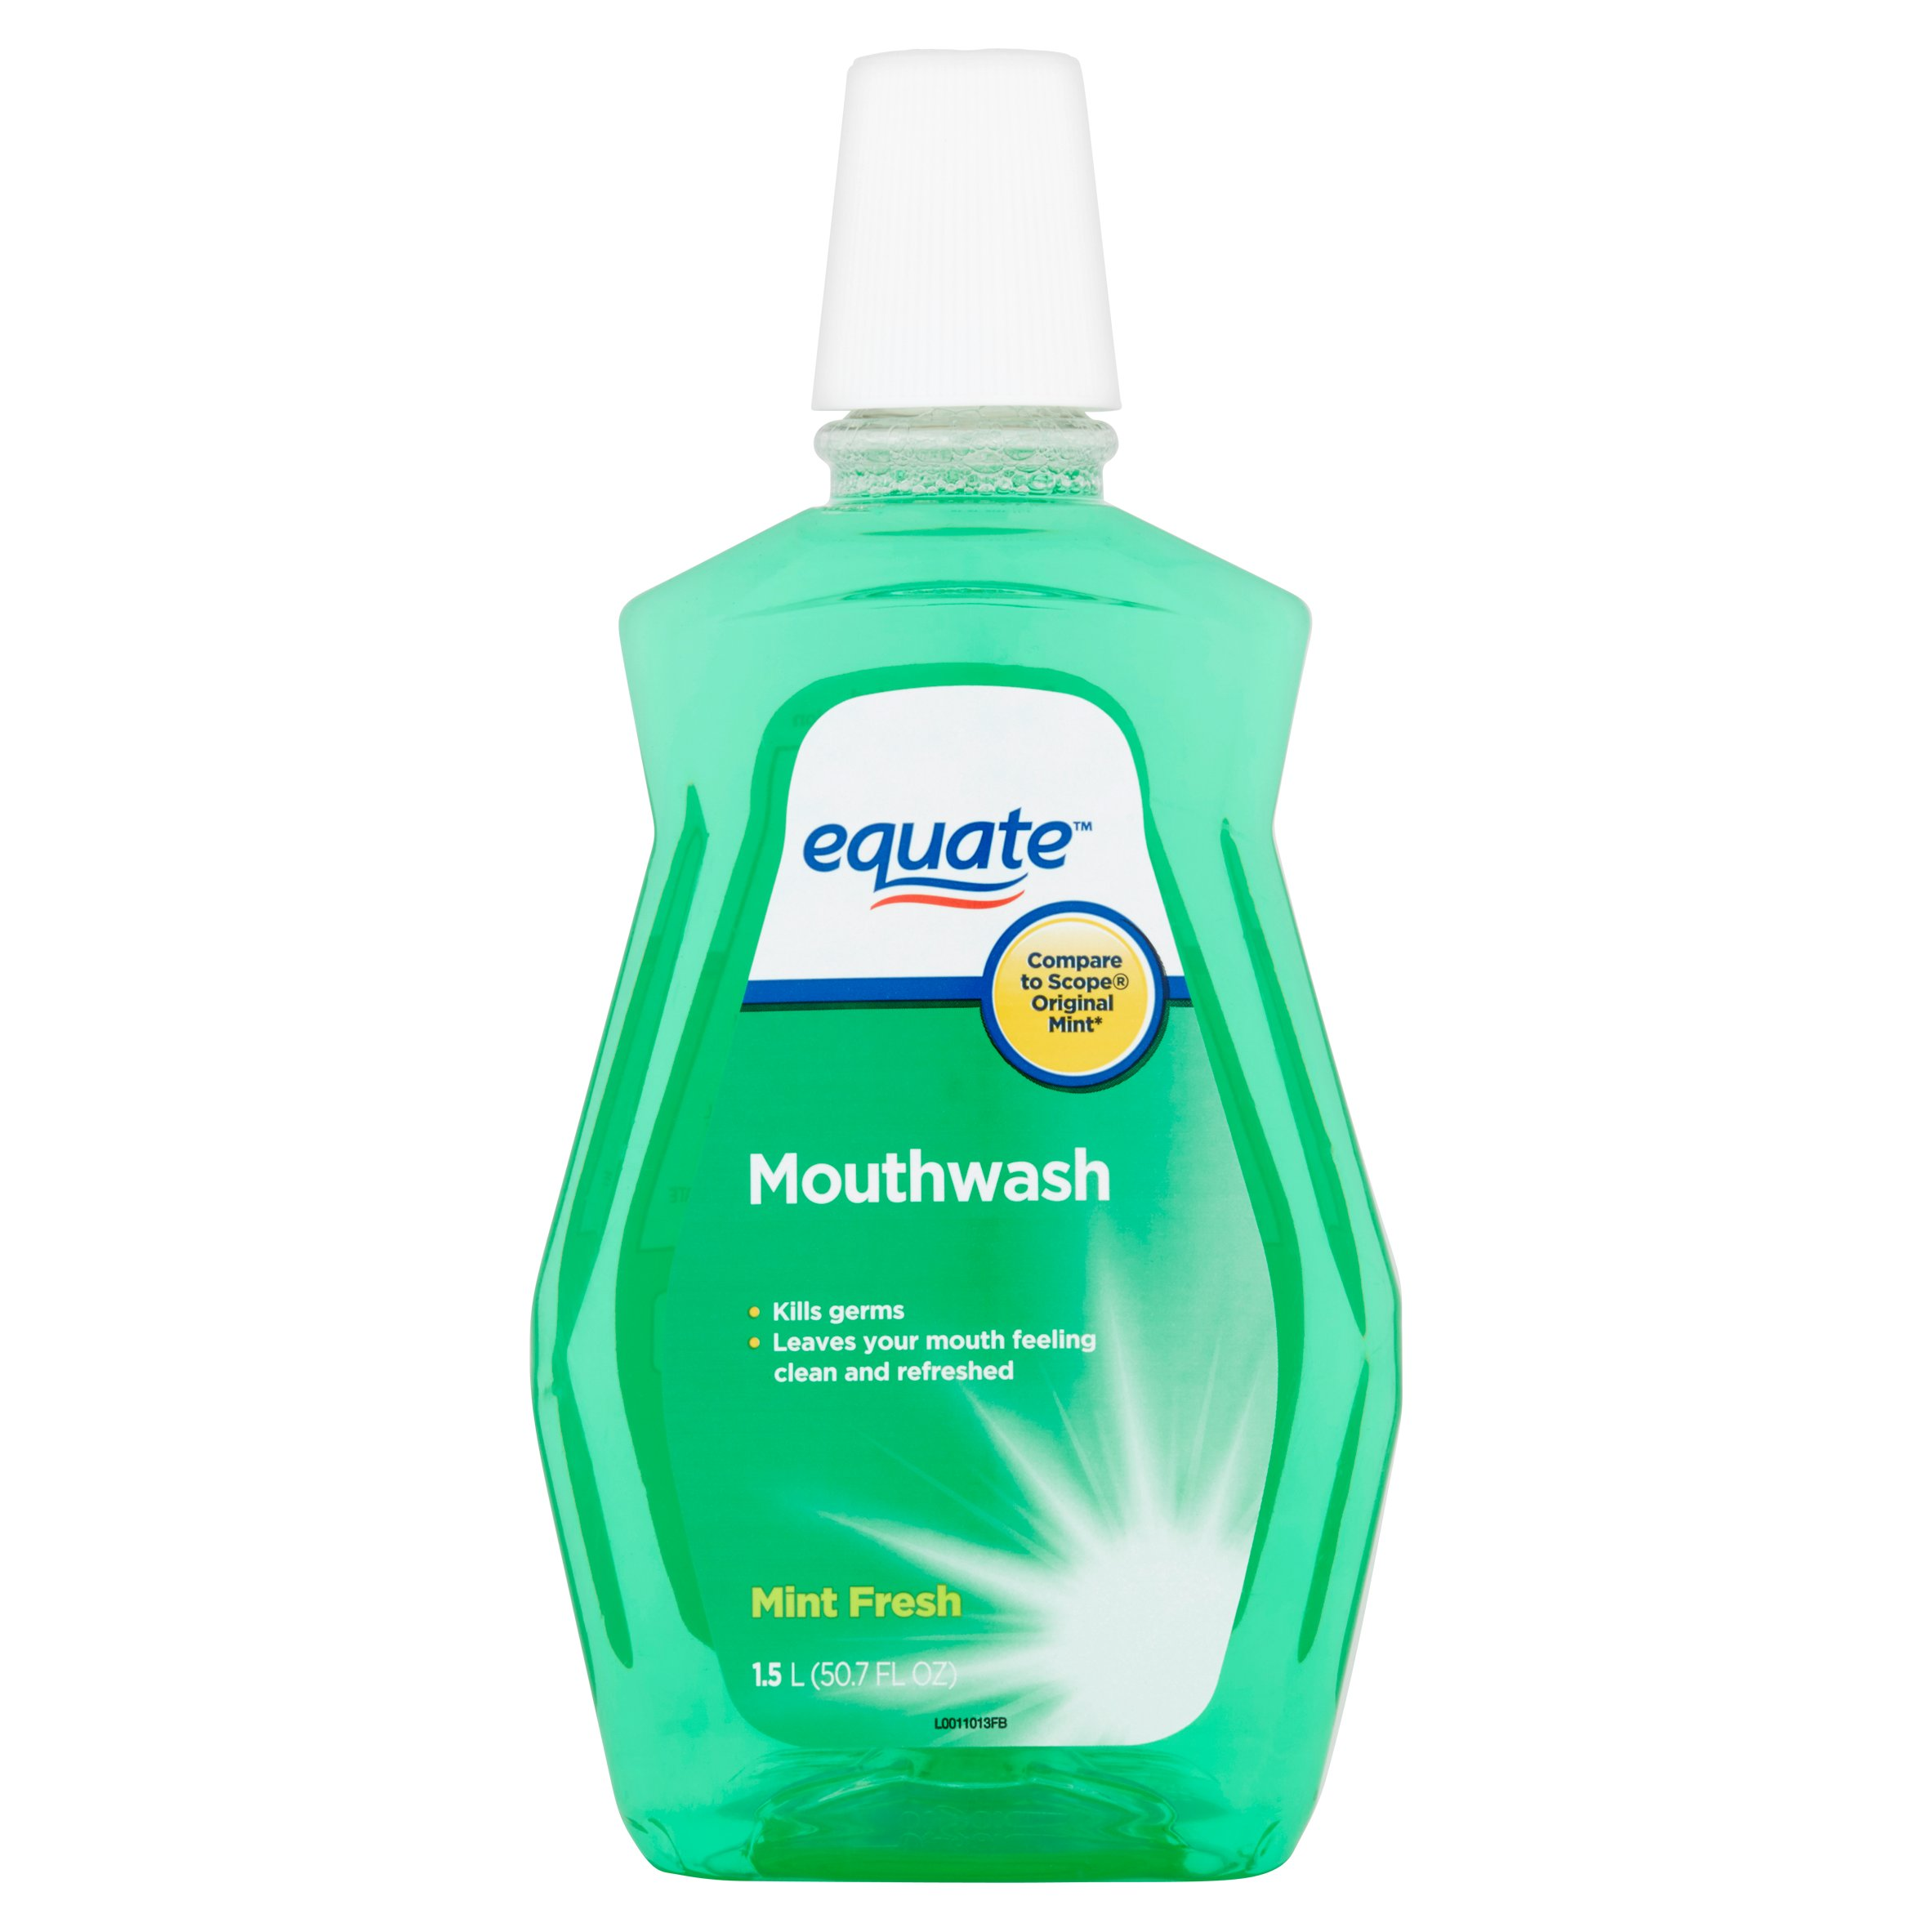 Equate Green Mint Mouthwash, 50.7 Oz